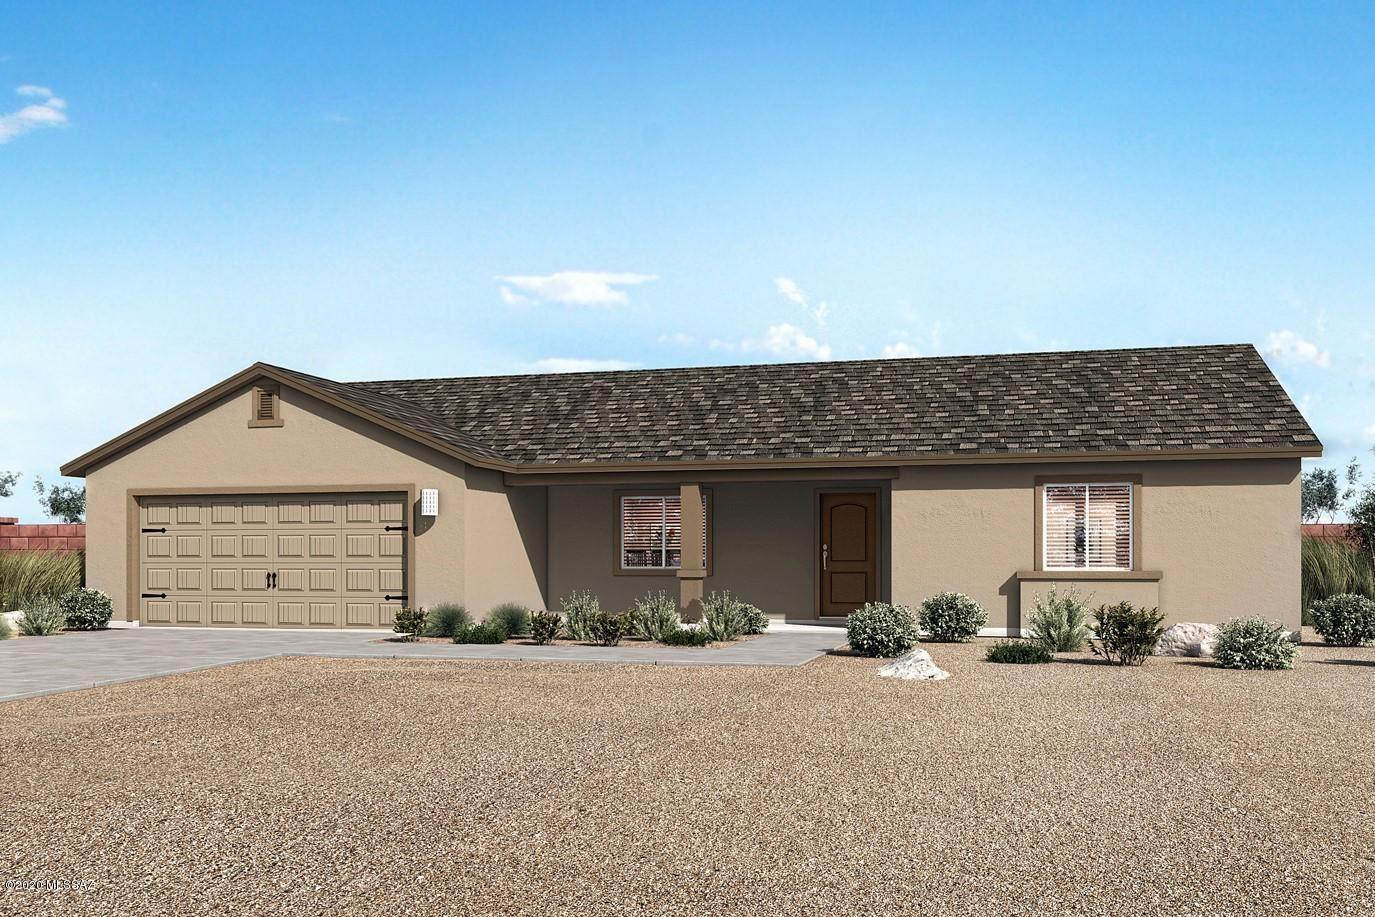 6984 S Victor Drive, Tucson, AZ 85757 - MLS#: 22015766